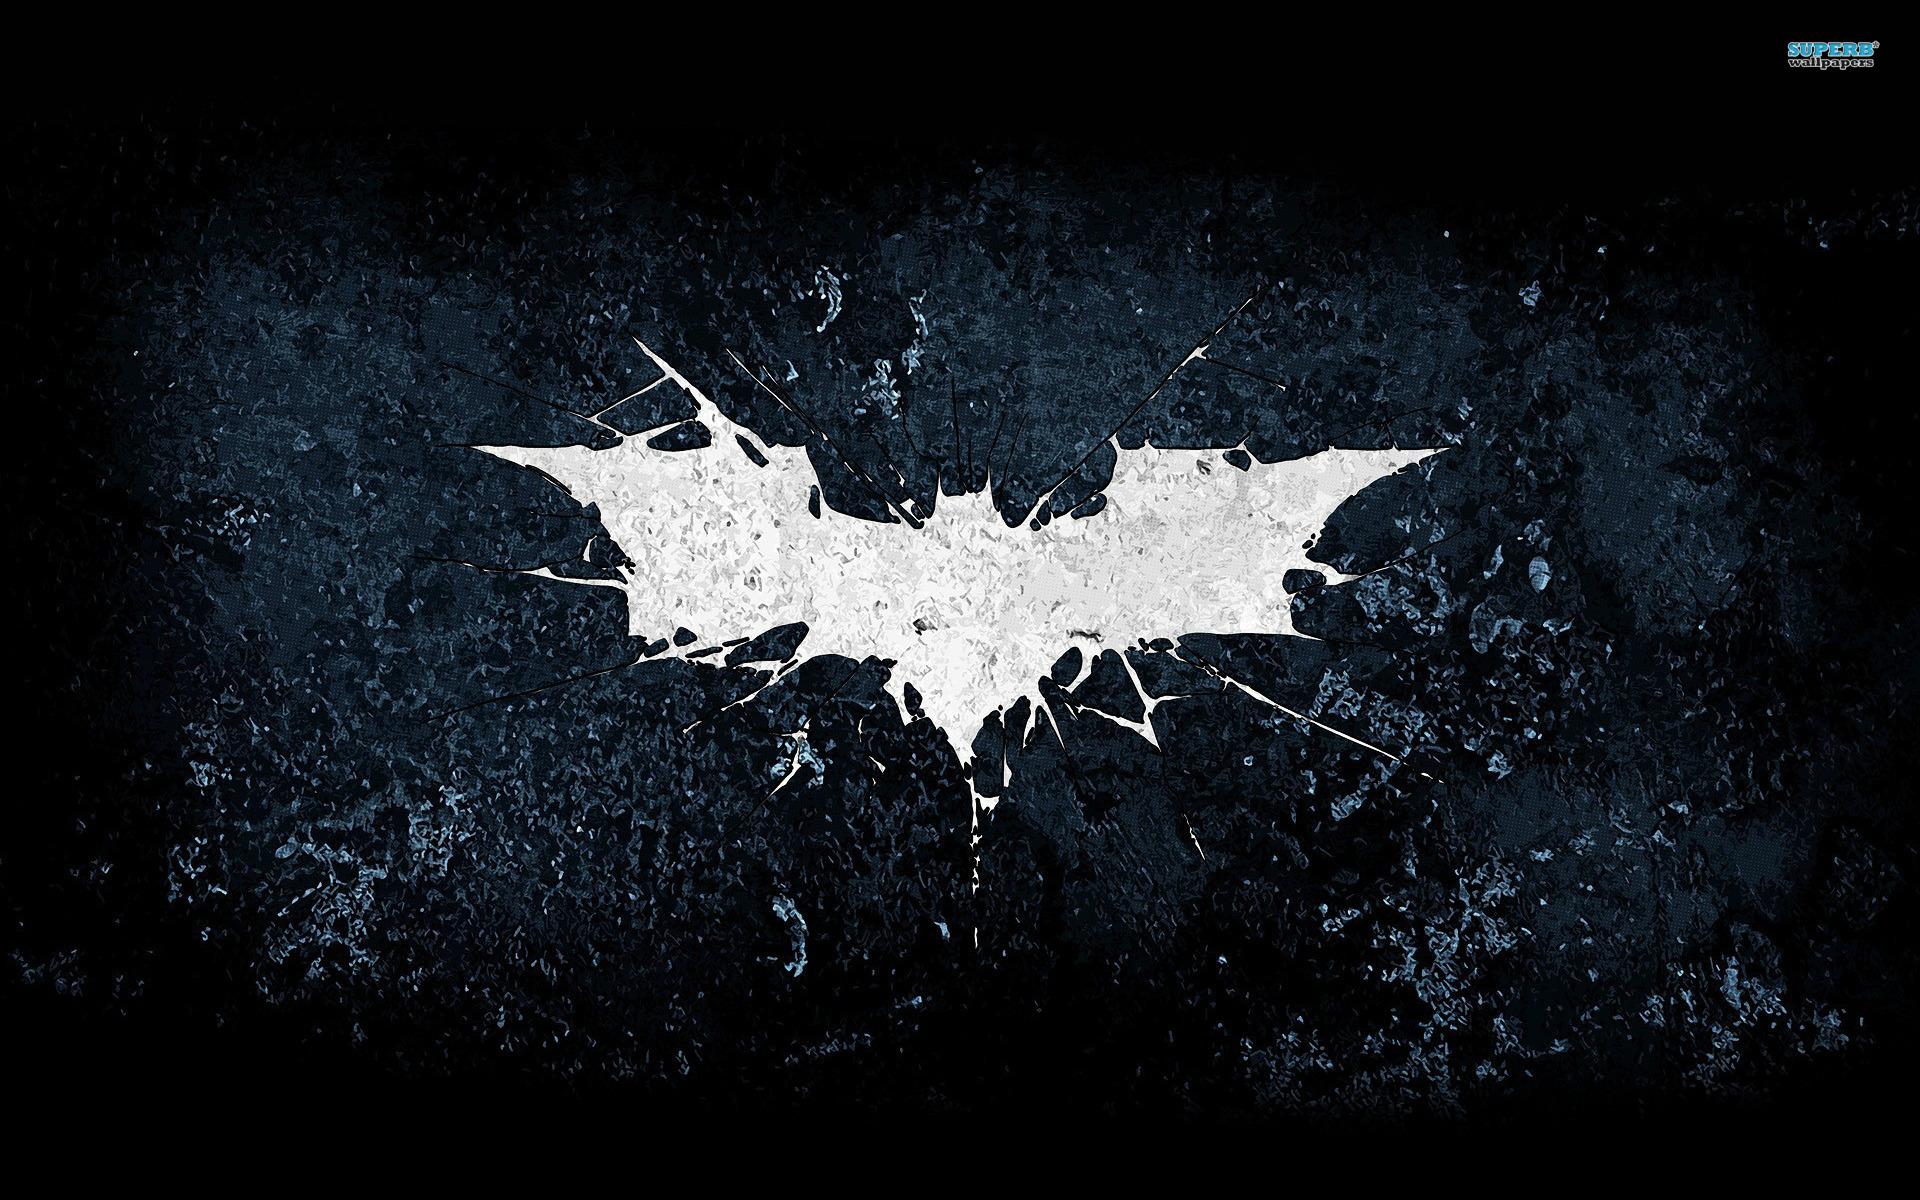 4k Batman Background Texture Wallpaper Wide Screen Wallpaper 1080p 1920x1200